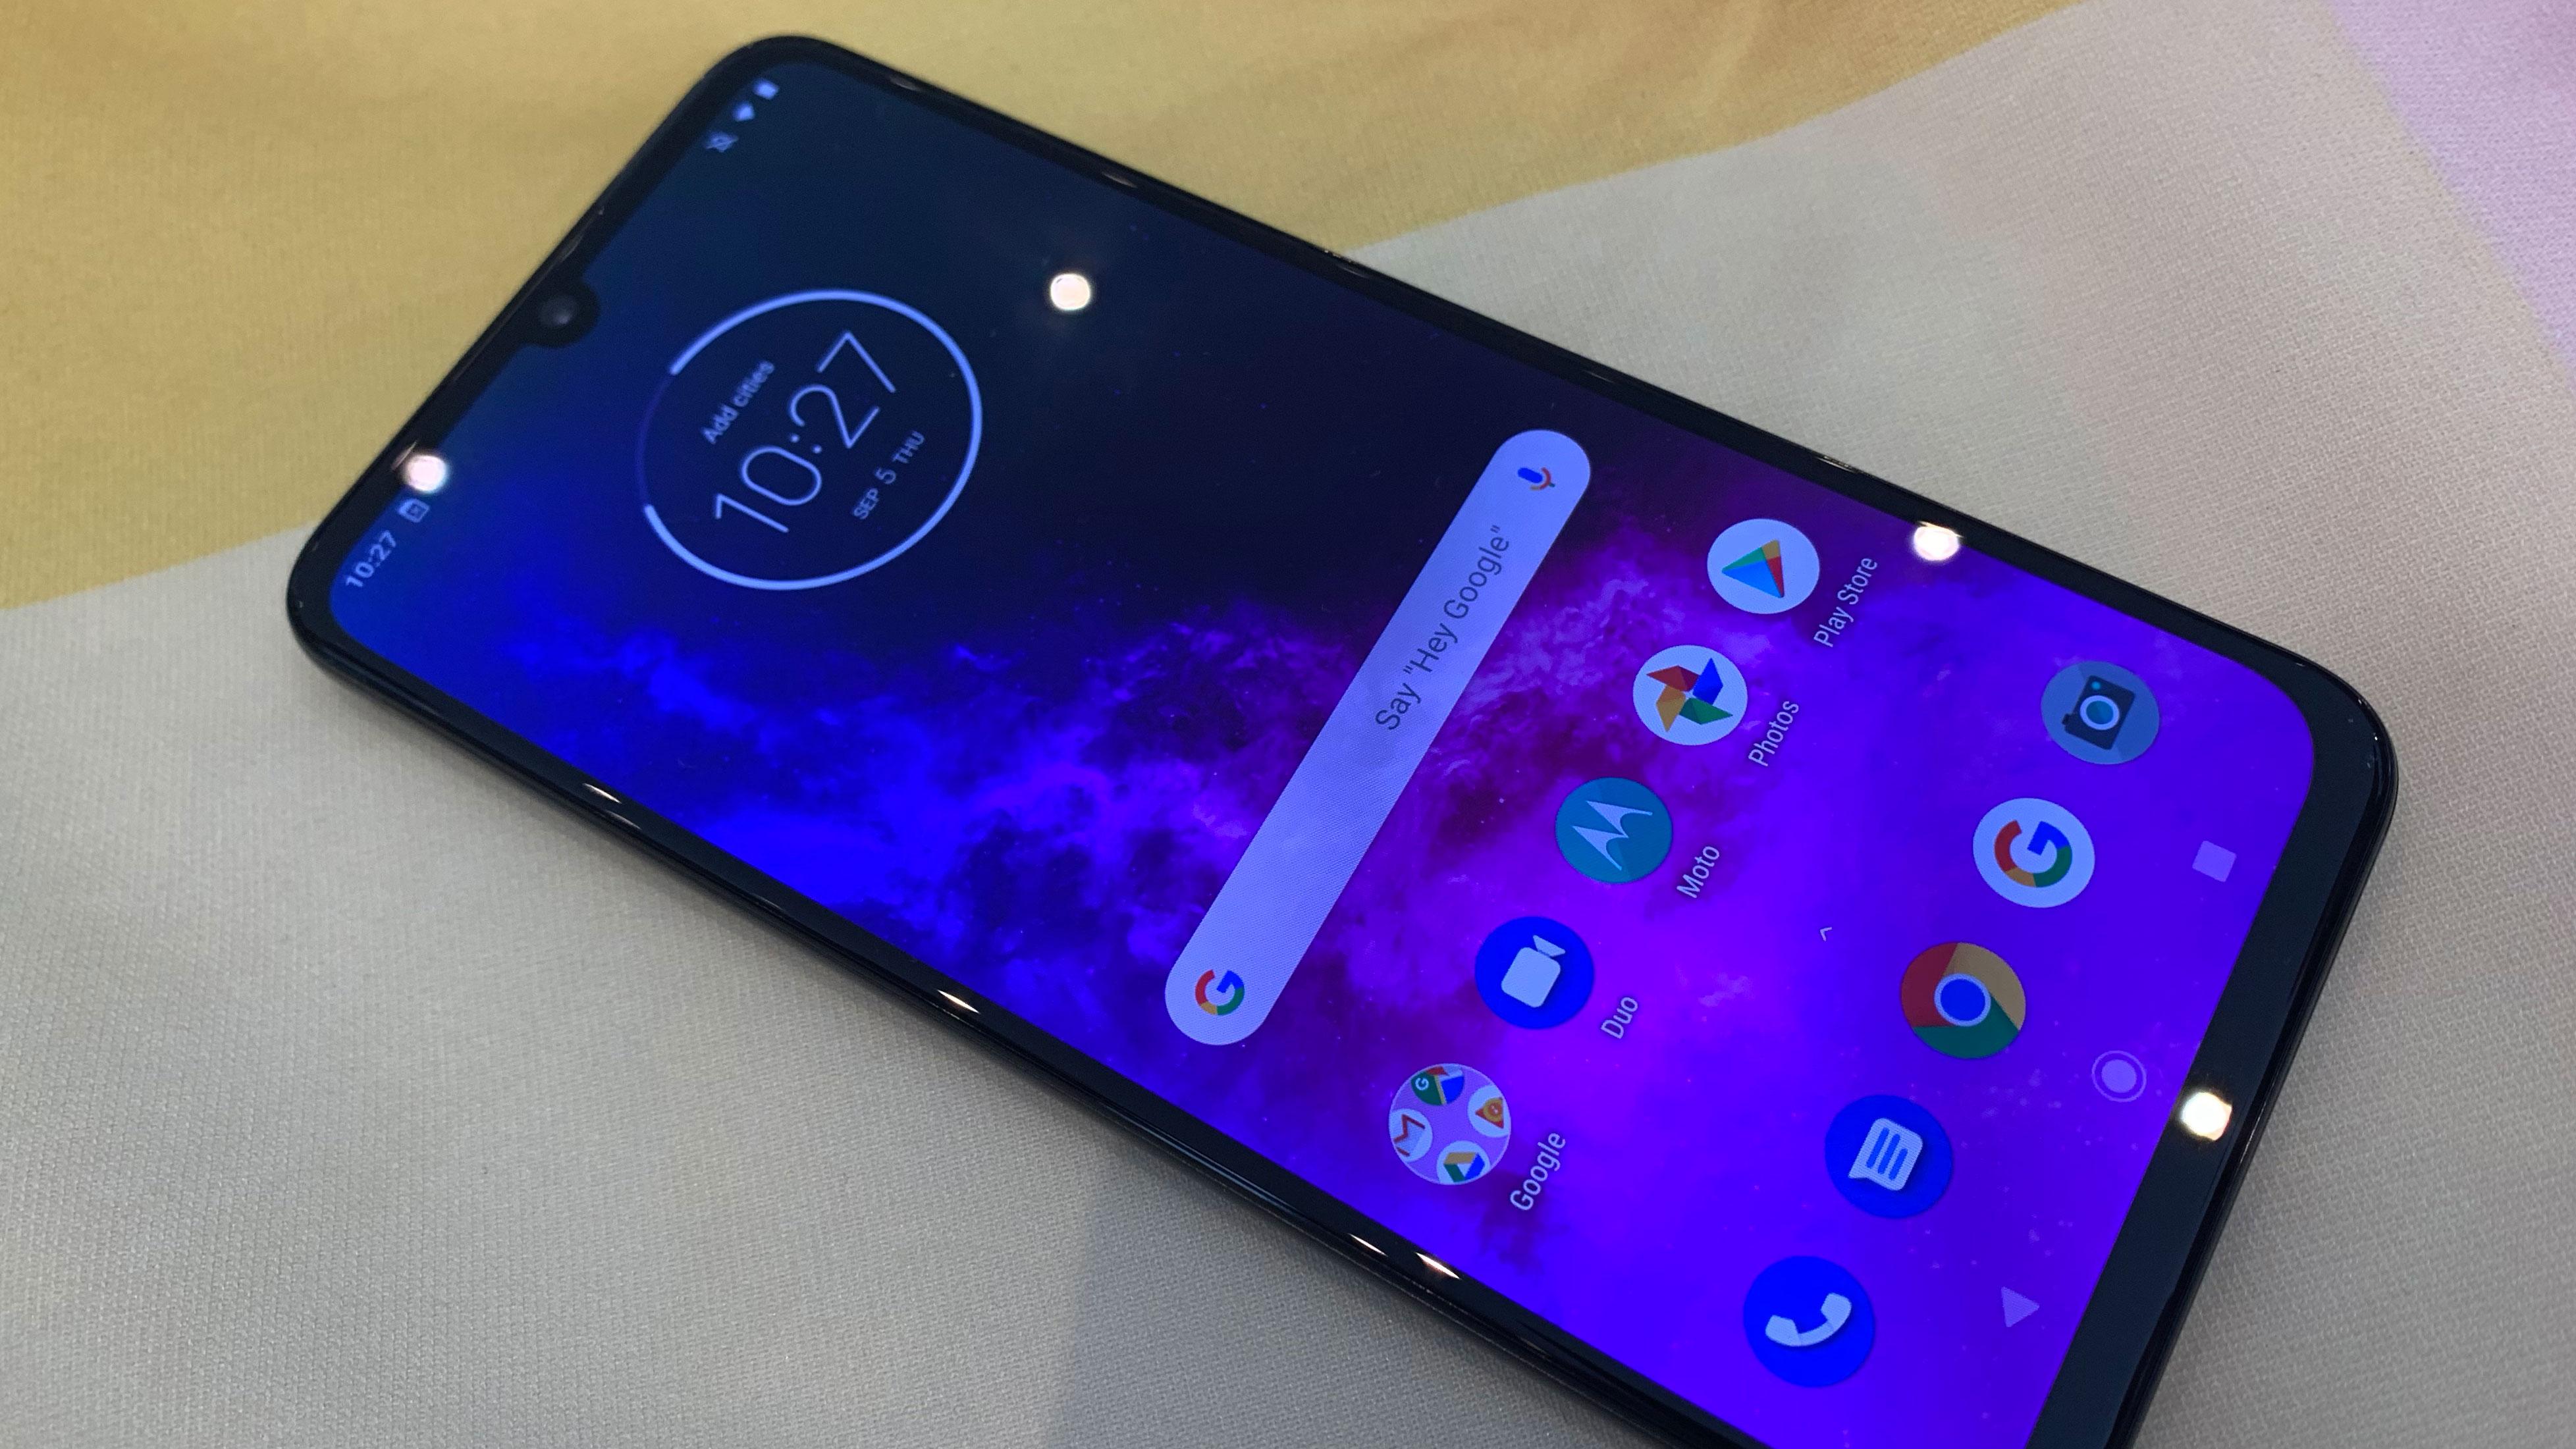 Motorola One Zoom is Moto